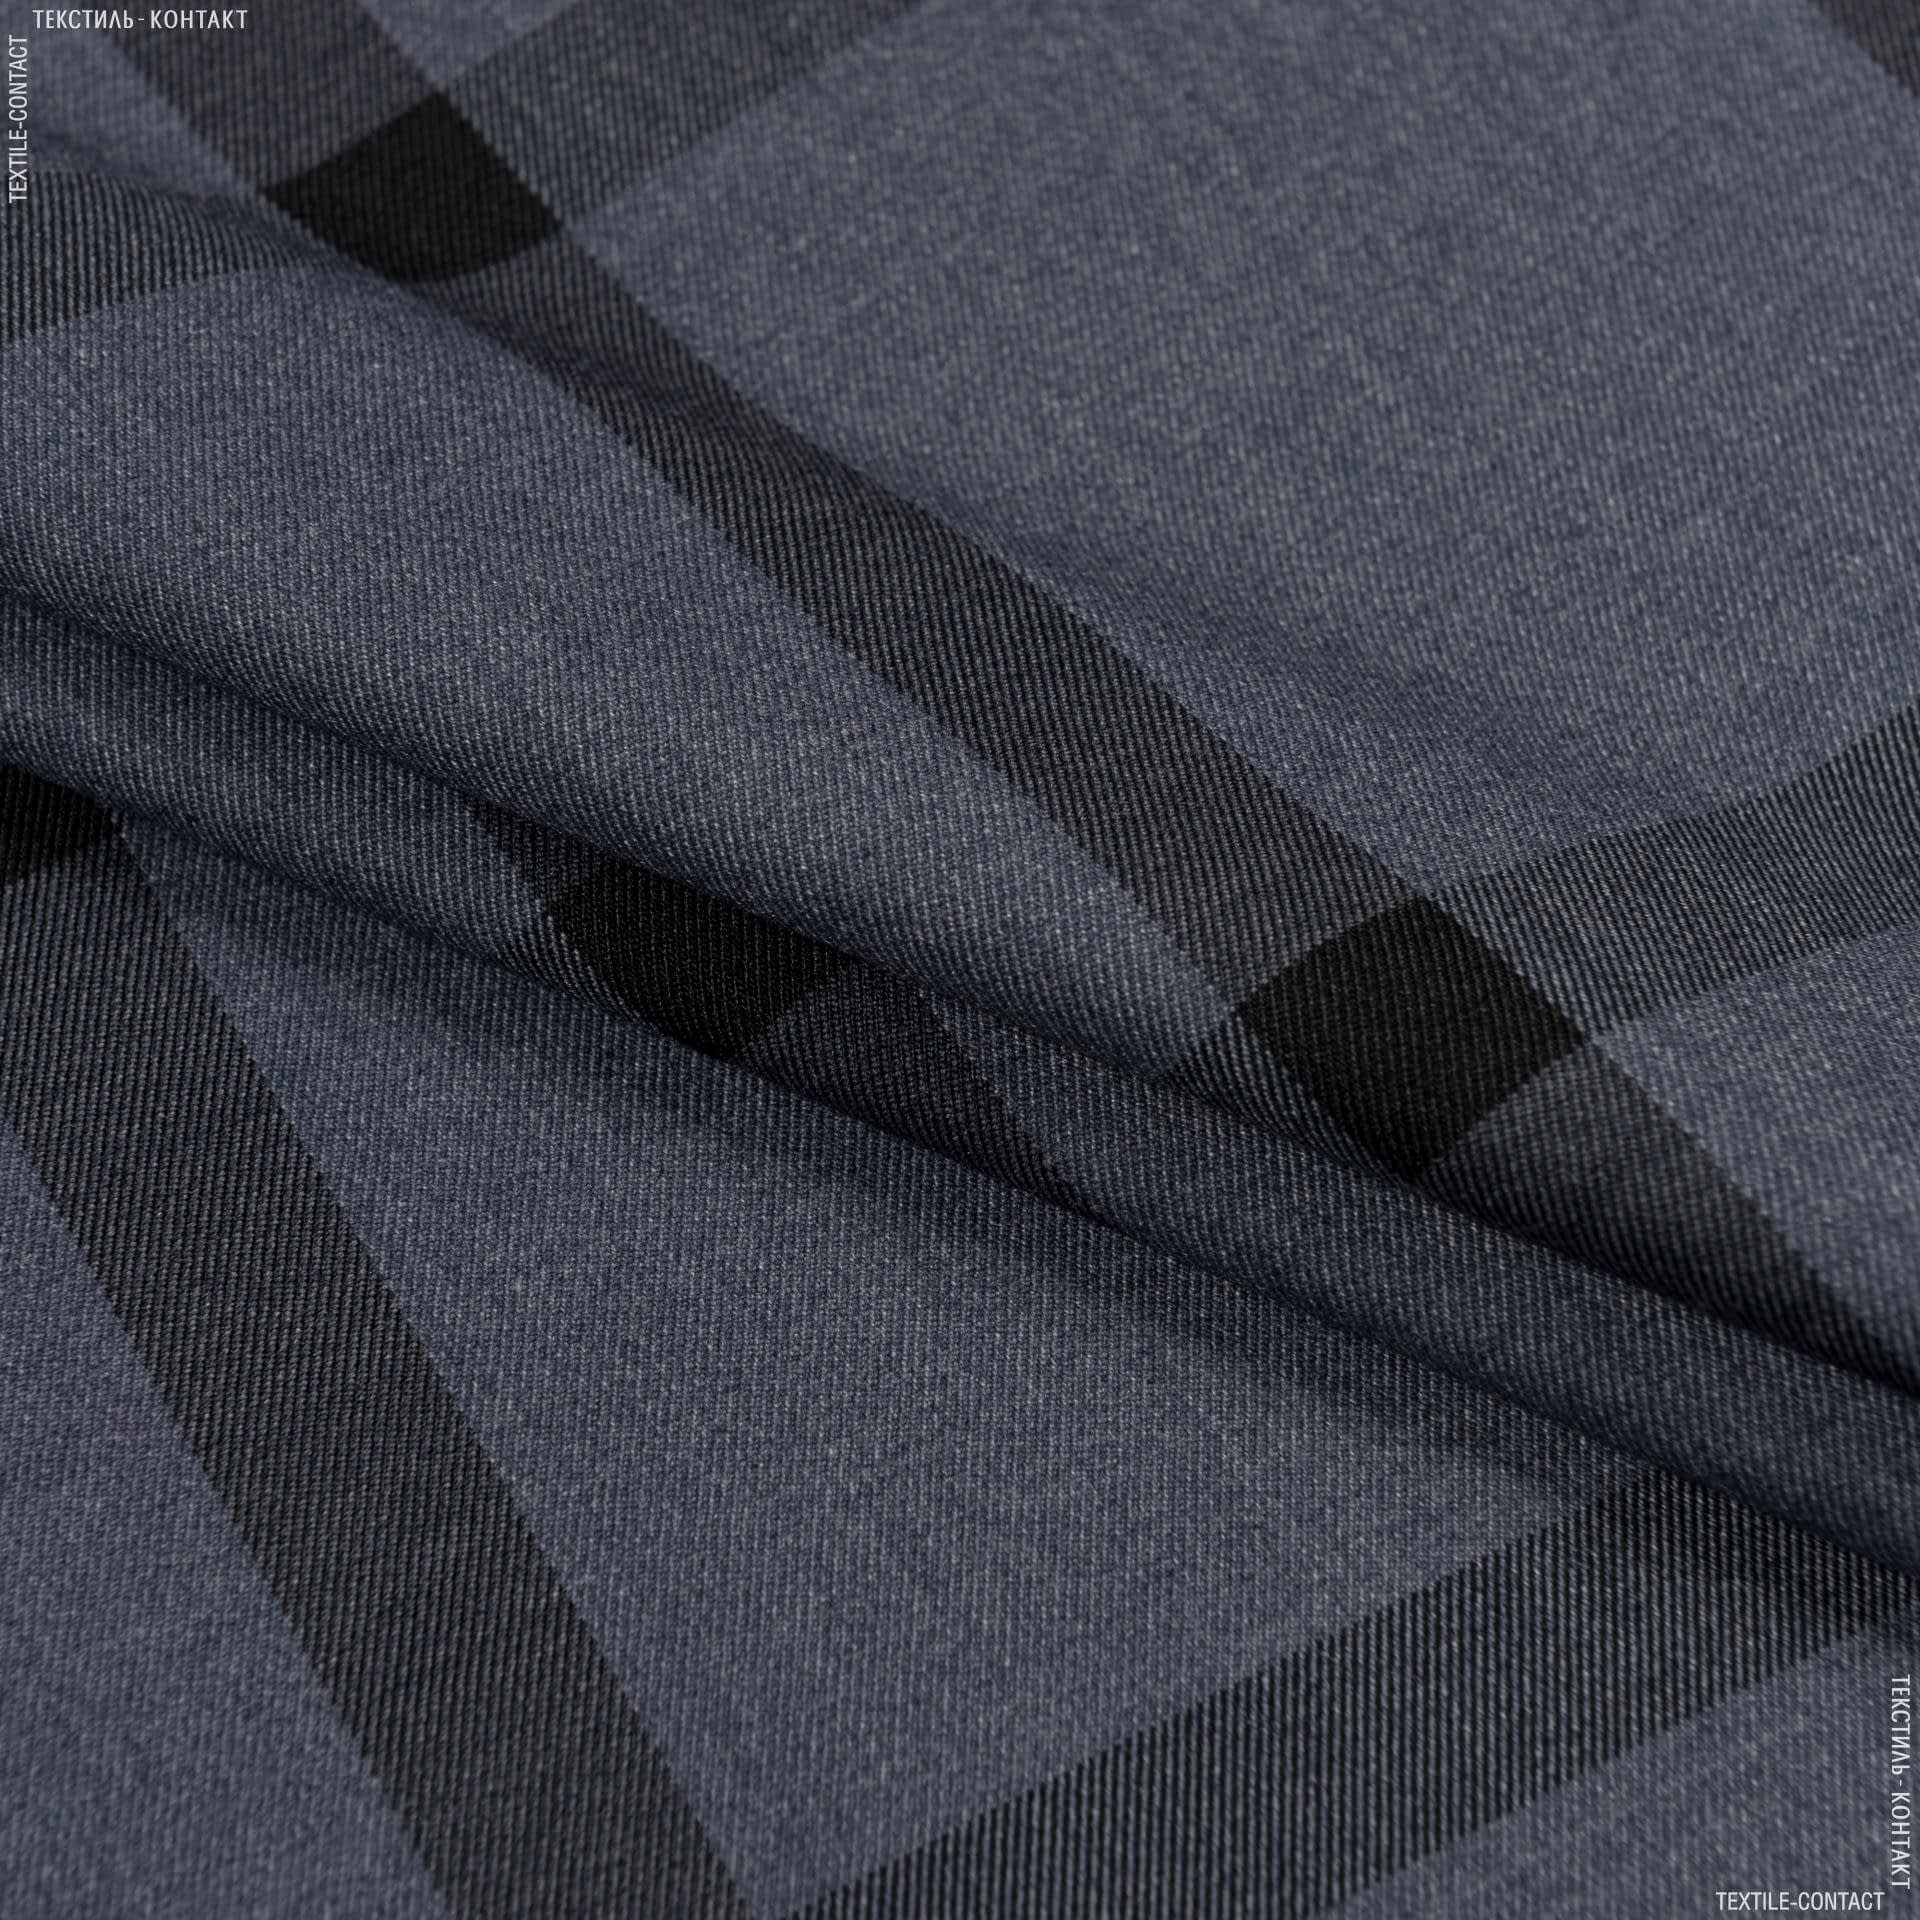 Ткани для брюк - Костюмная ткань